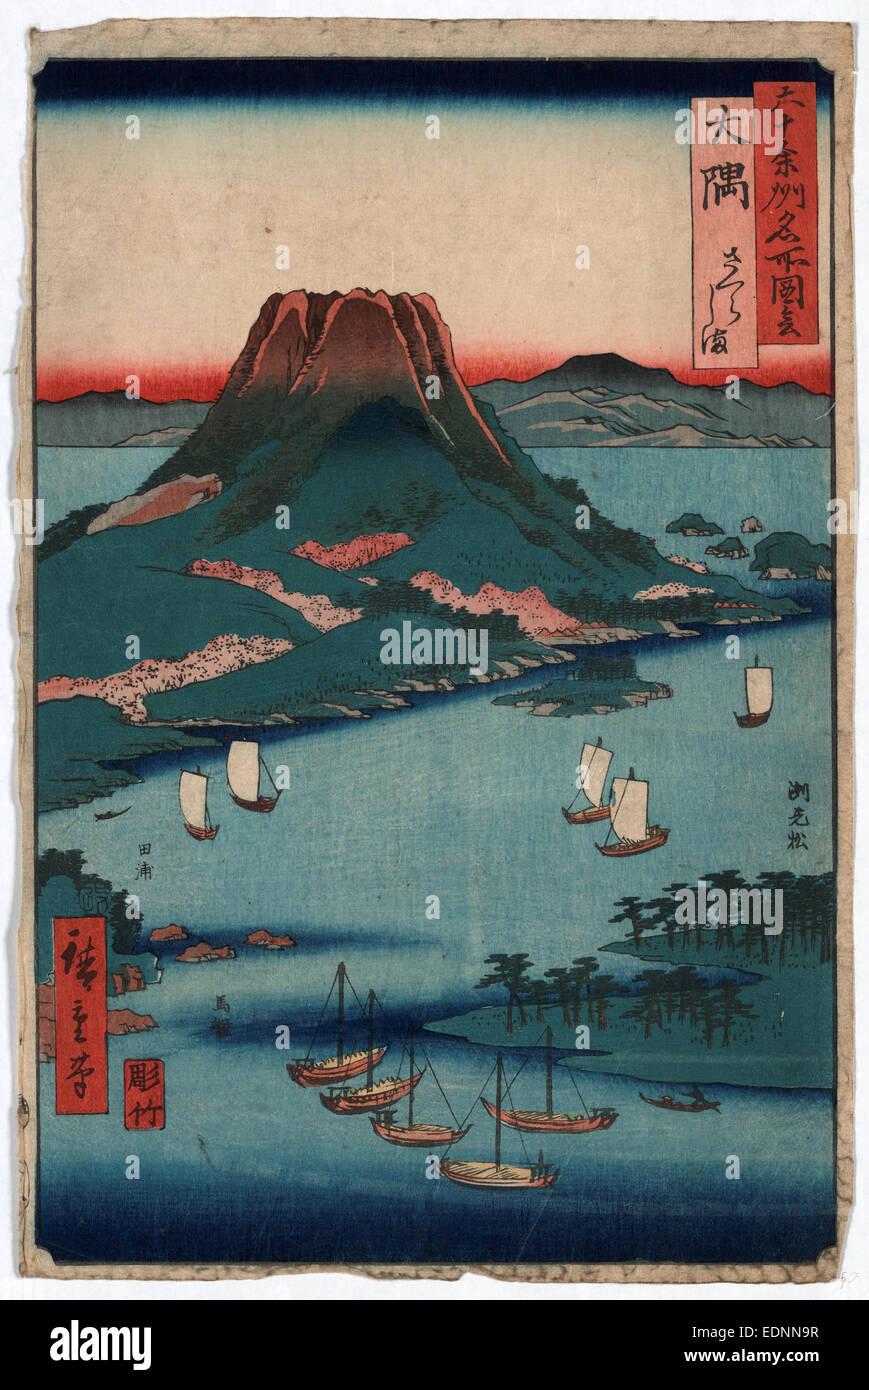 Osumi, Ando, Hiroshige, 1797-1858, artist, 1854., 1 print : woodcut, color ; 35.8 x 23.5 cm., Print shows the volcano - Stock Image